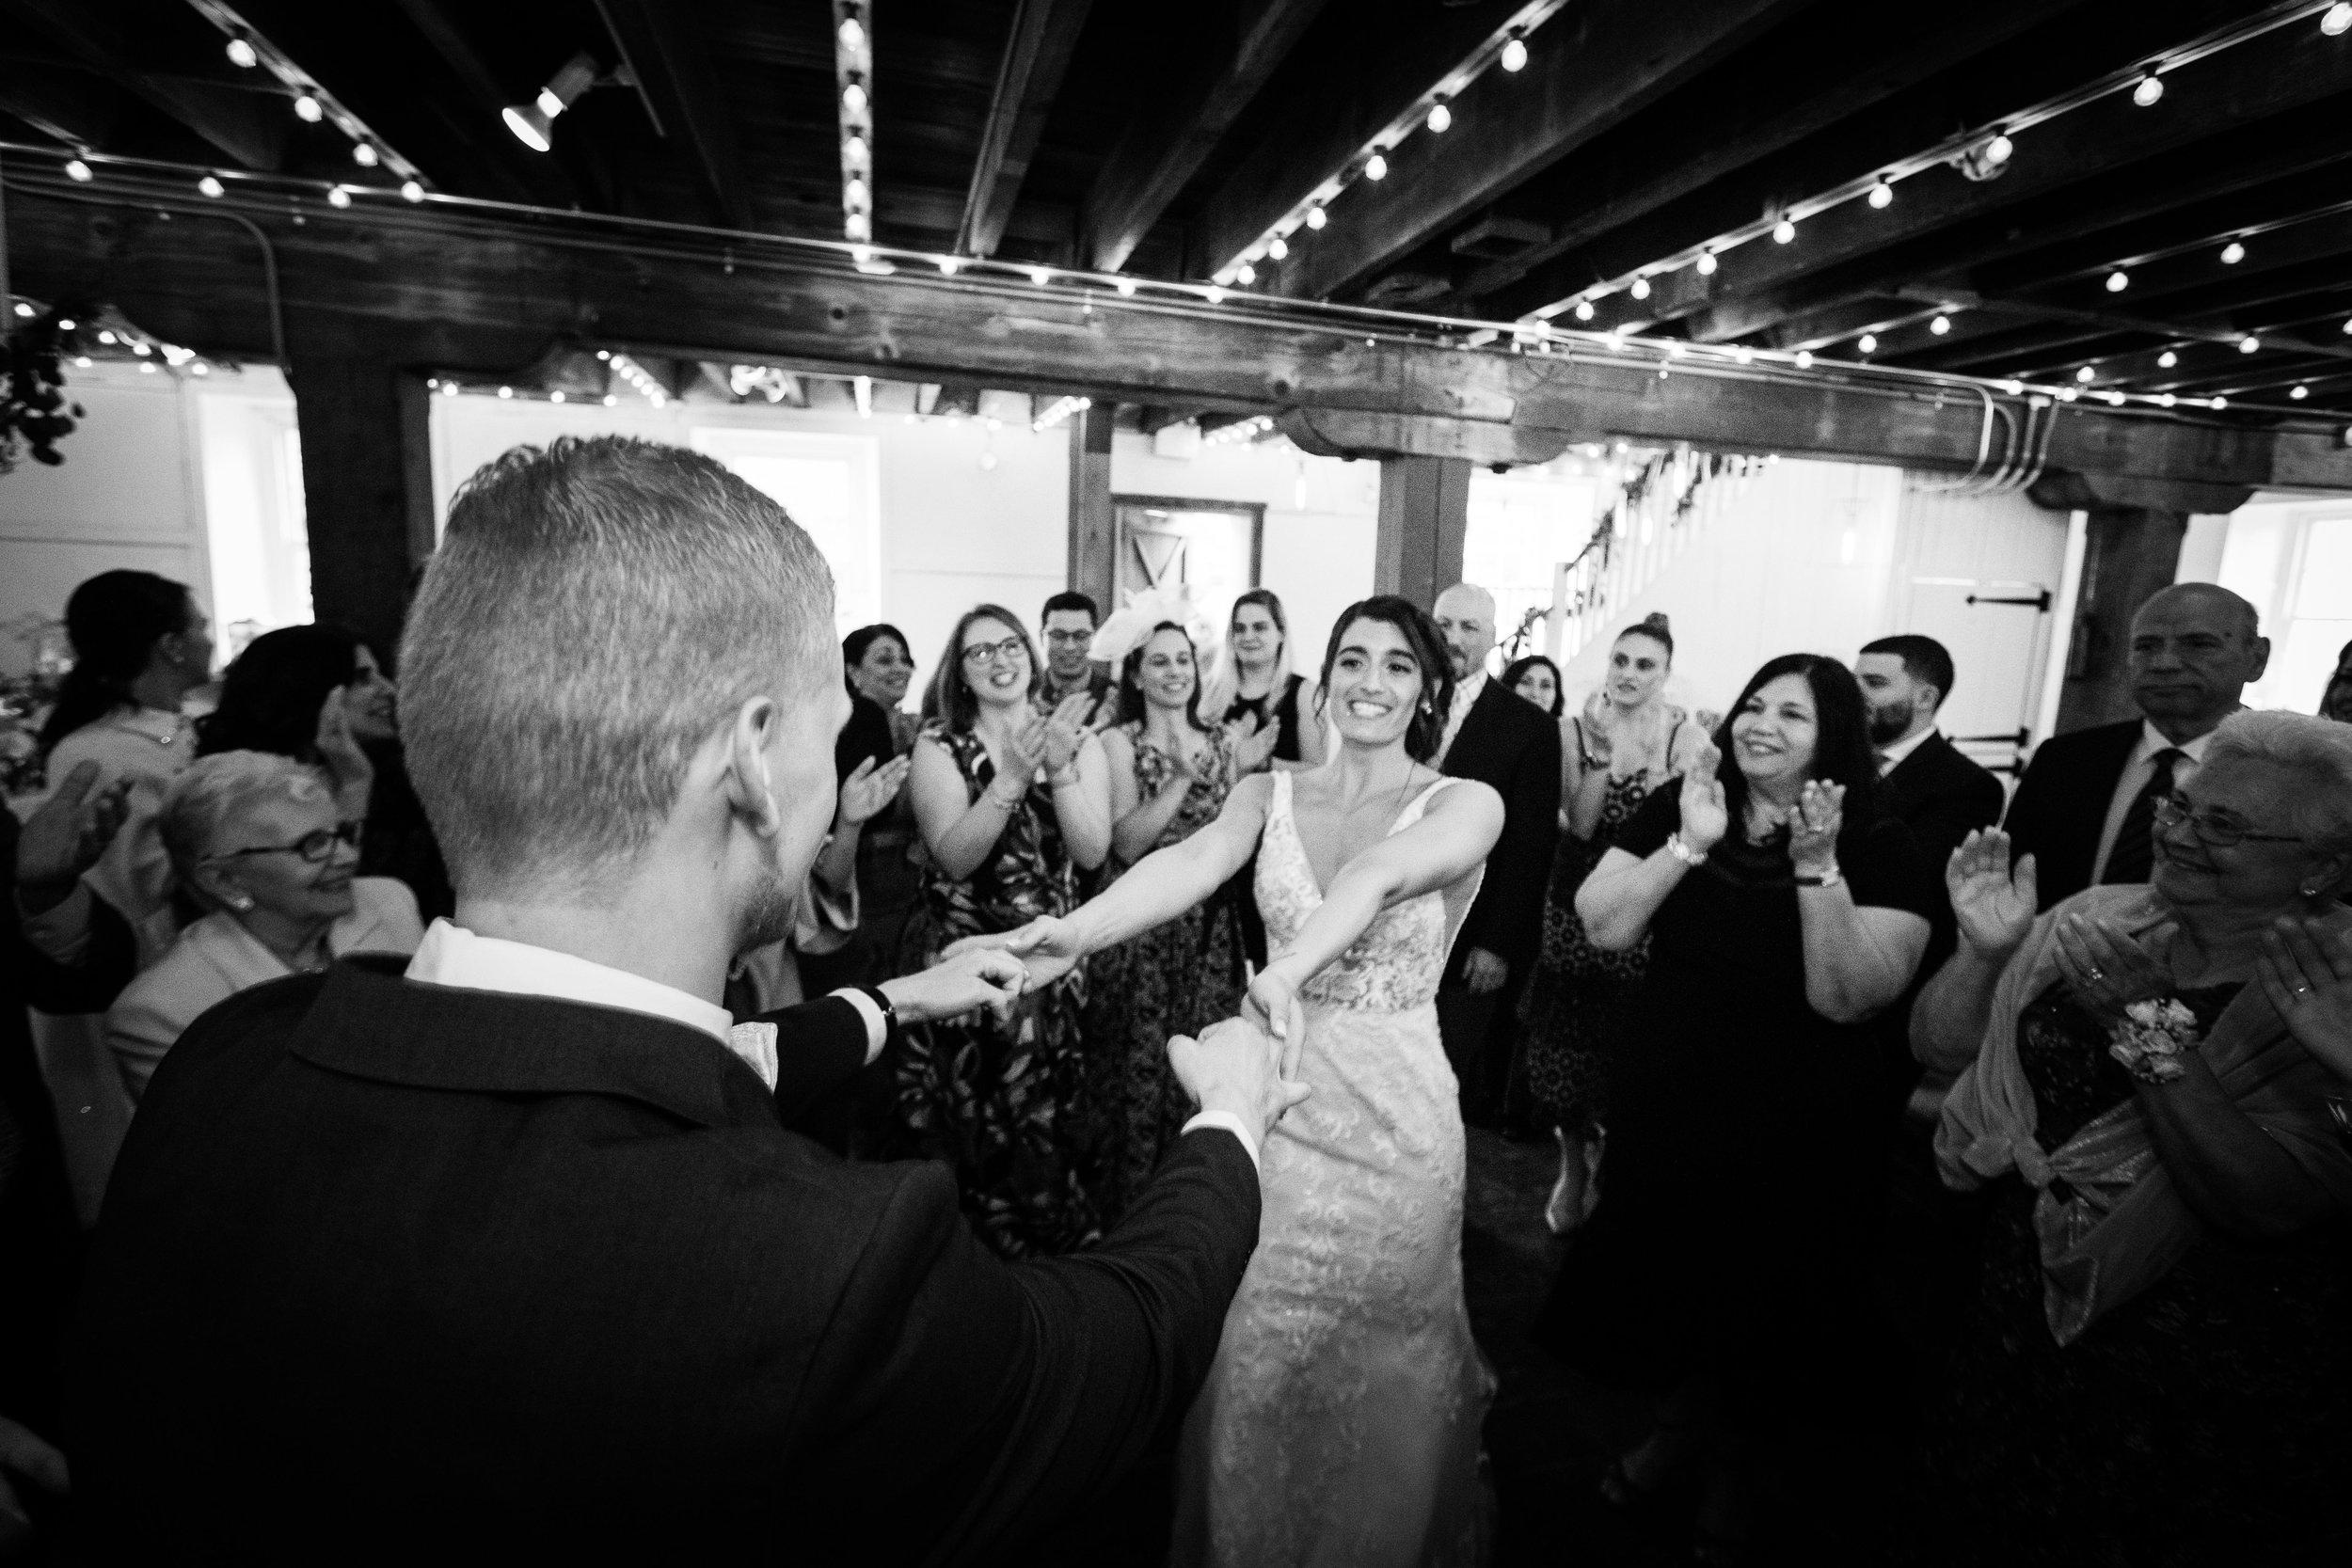 PRALLISVILLE MILLS NEW HOPE WEDDING PHOTOGRAPHY-108.jpg